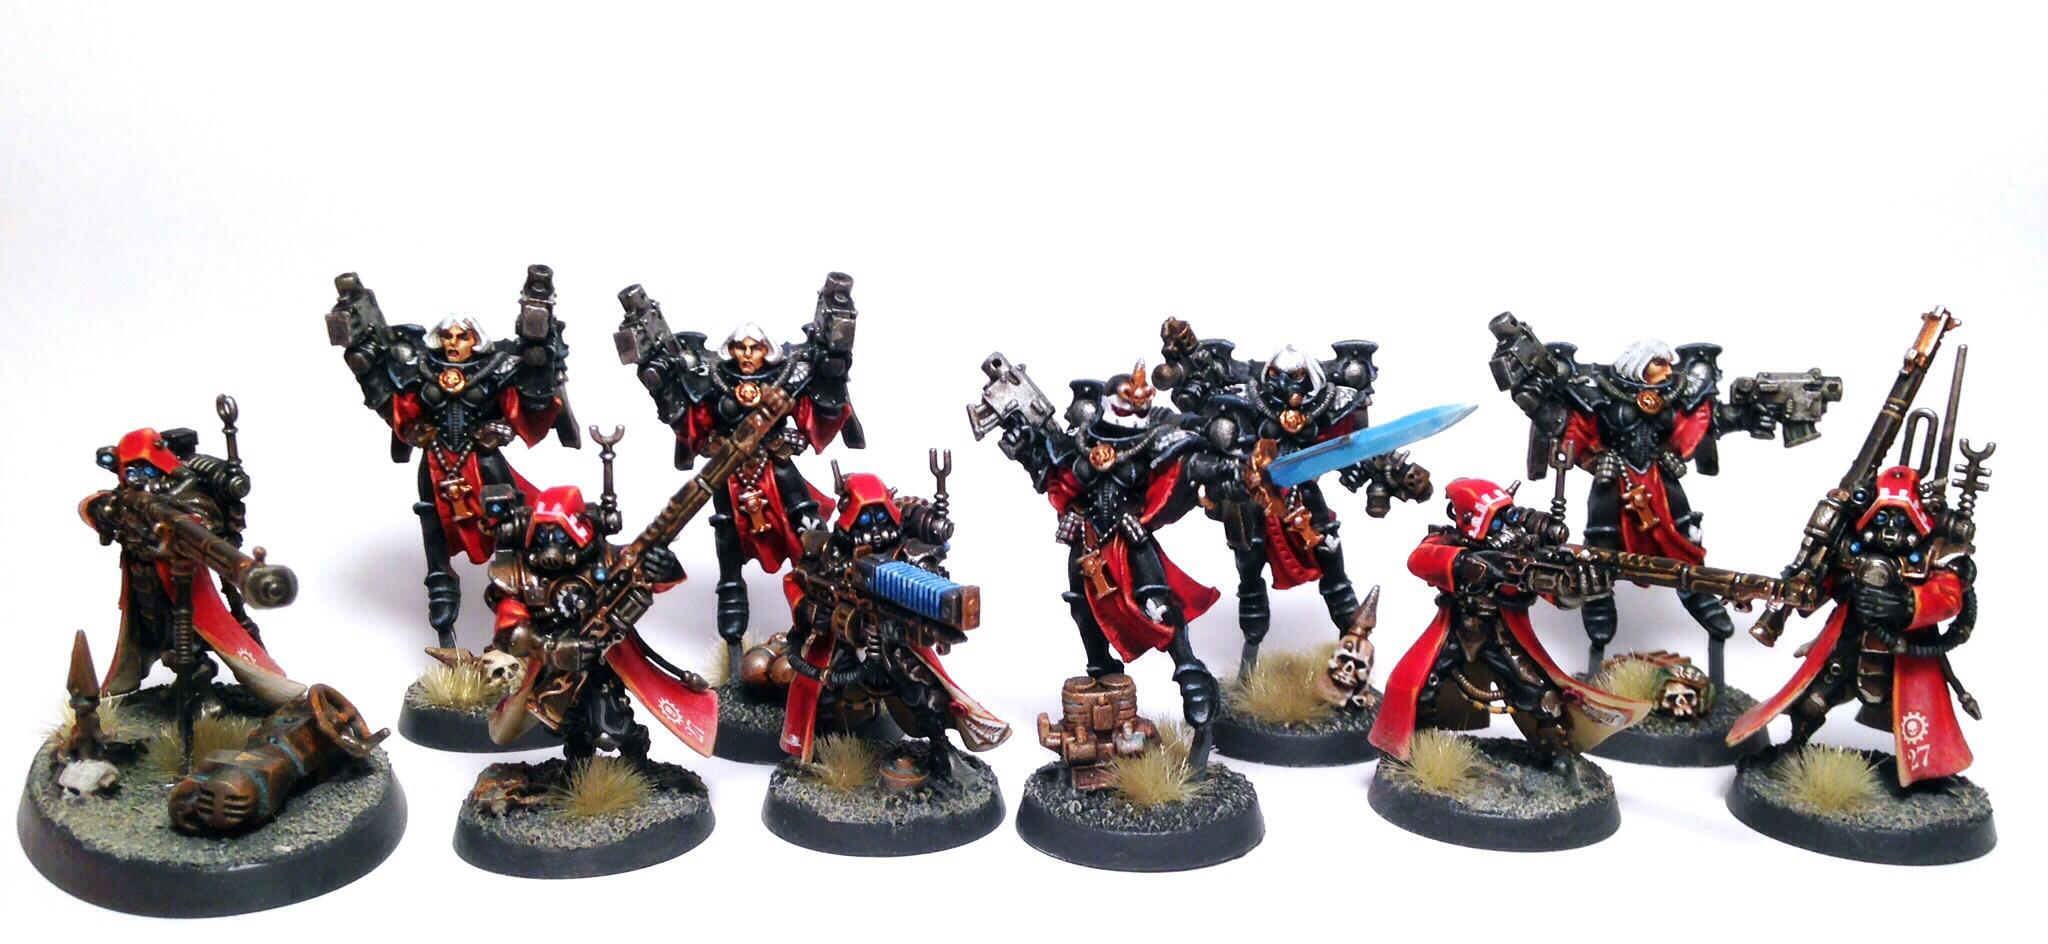 Adeptus Mechanicus, Battle Sisters, Seraphim, Sisters Of Battle, Skitarii